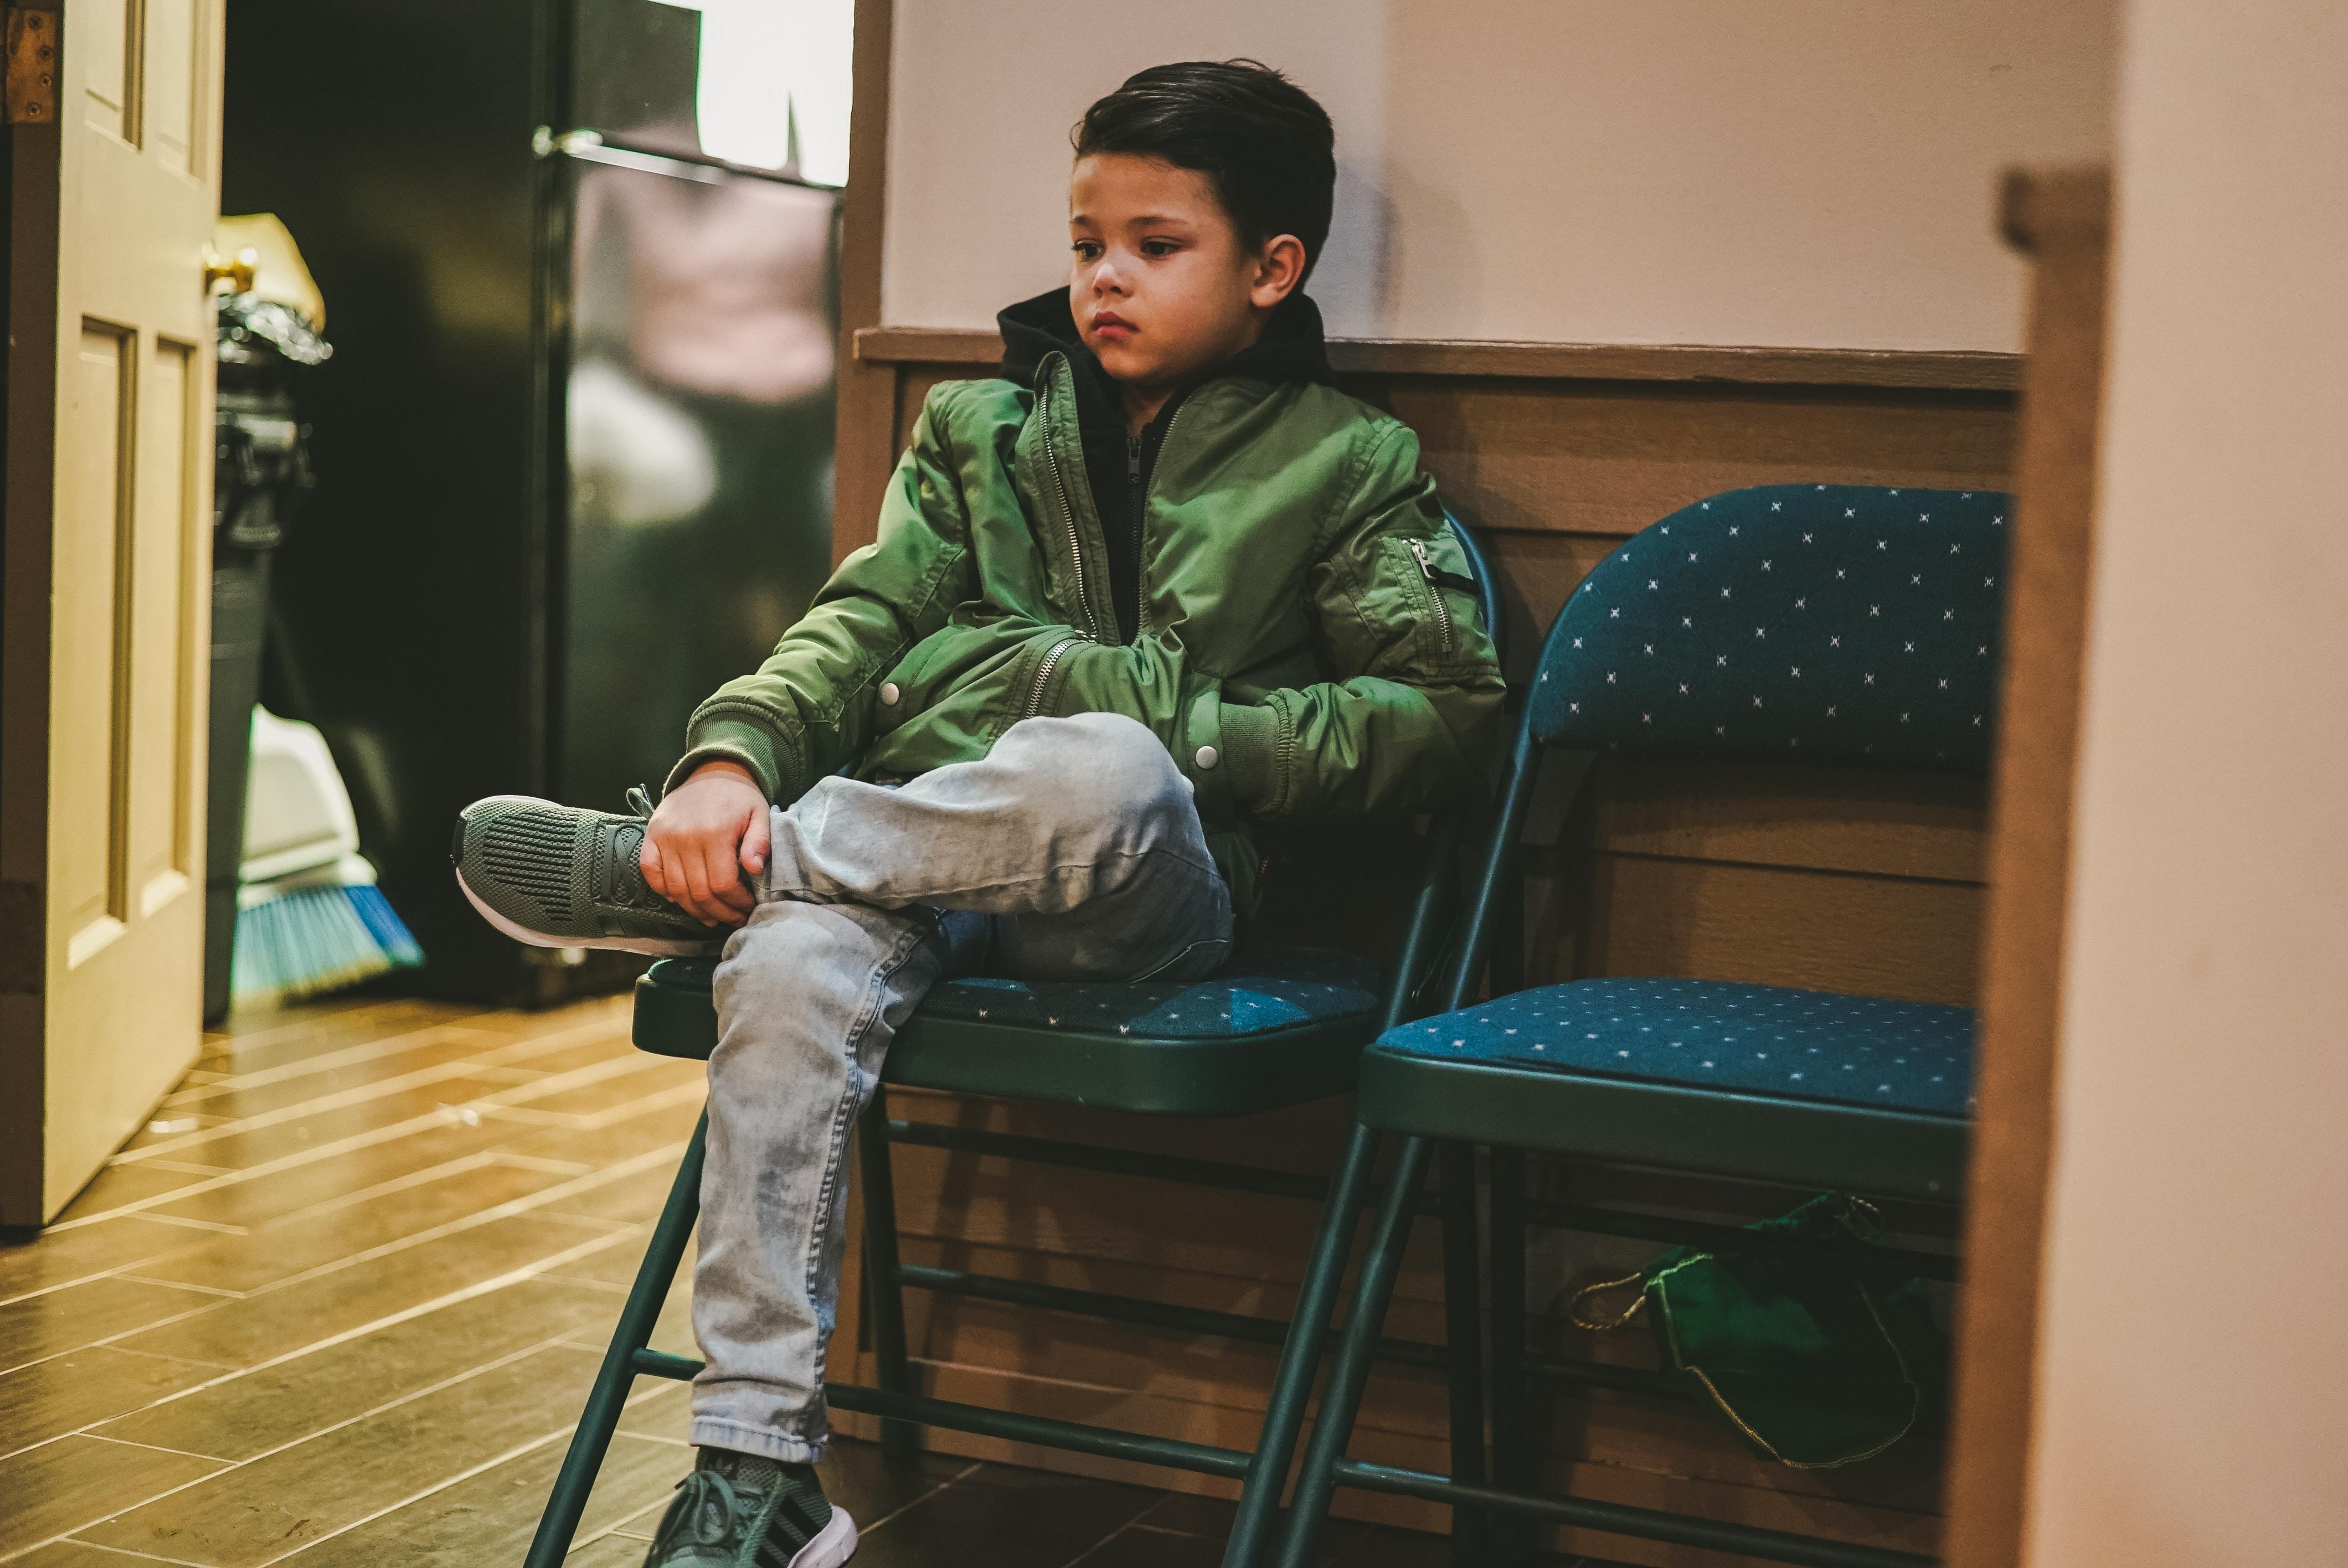 boy in green jacket sits on folding padded chair near door inside room